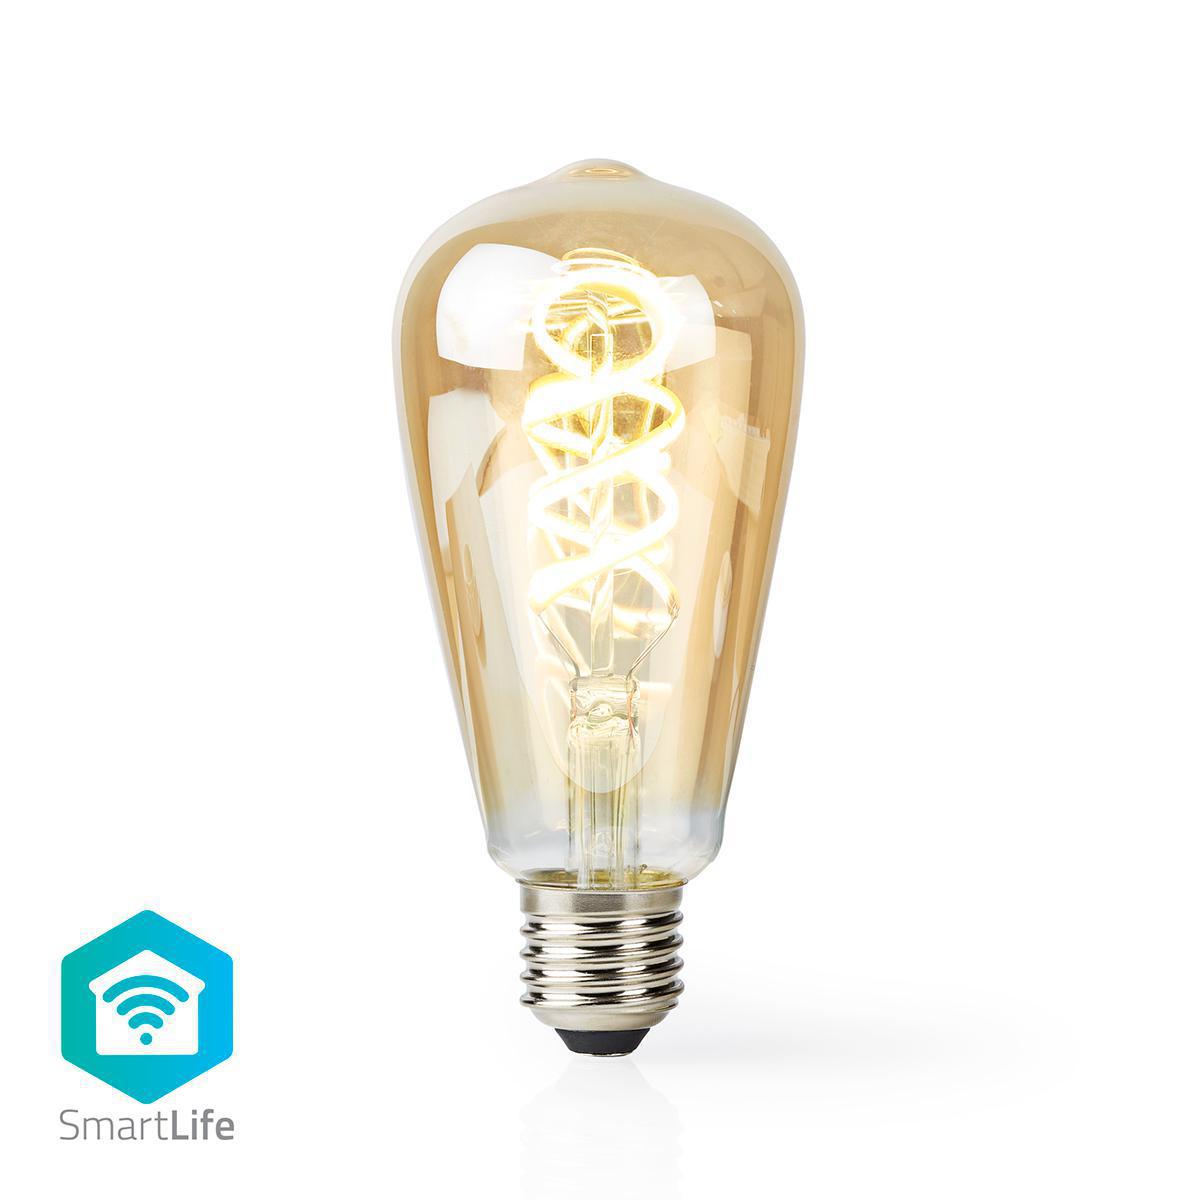 Slimme Led Edison Lamp met wifi E27 fitting 1800K - 6500K - vooraanzicht lamp